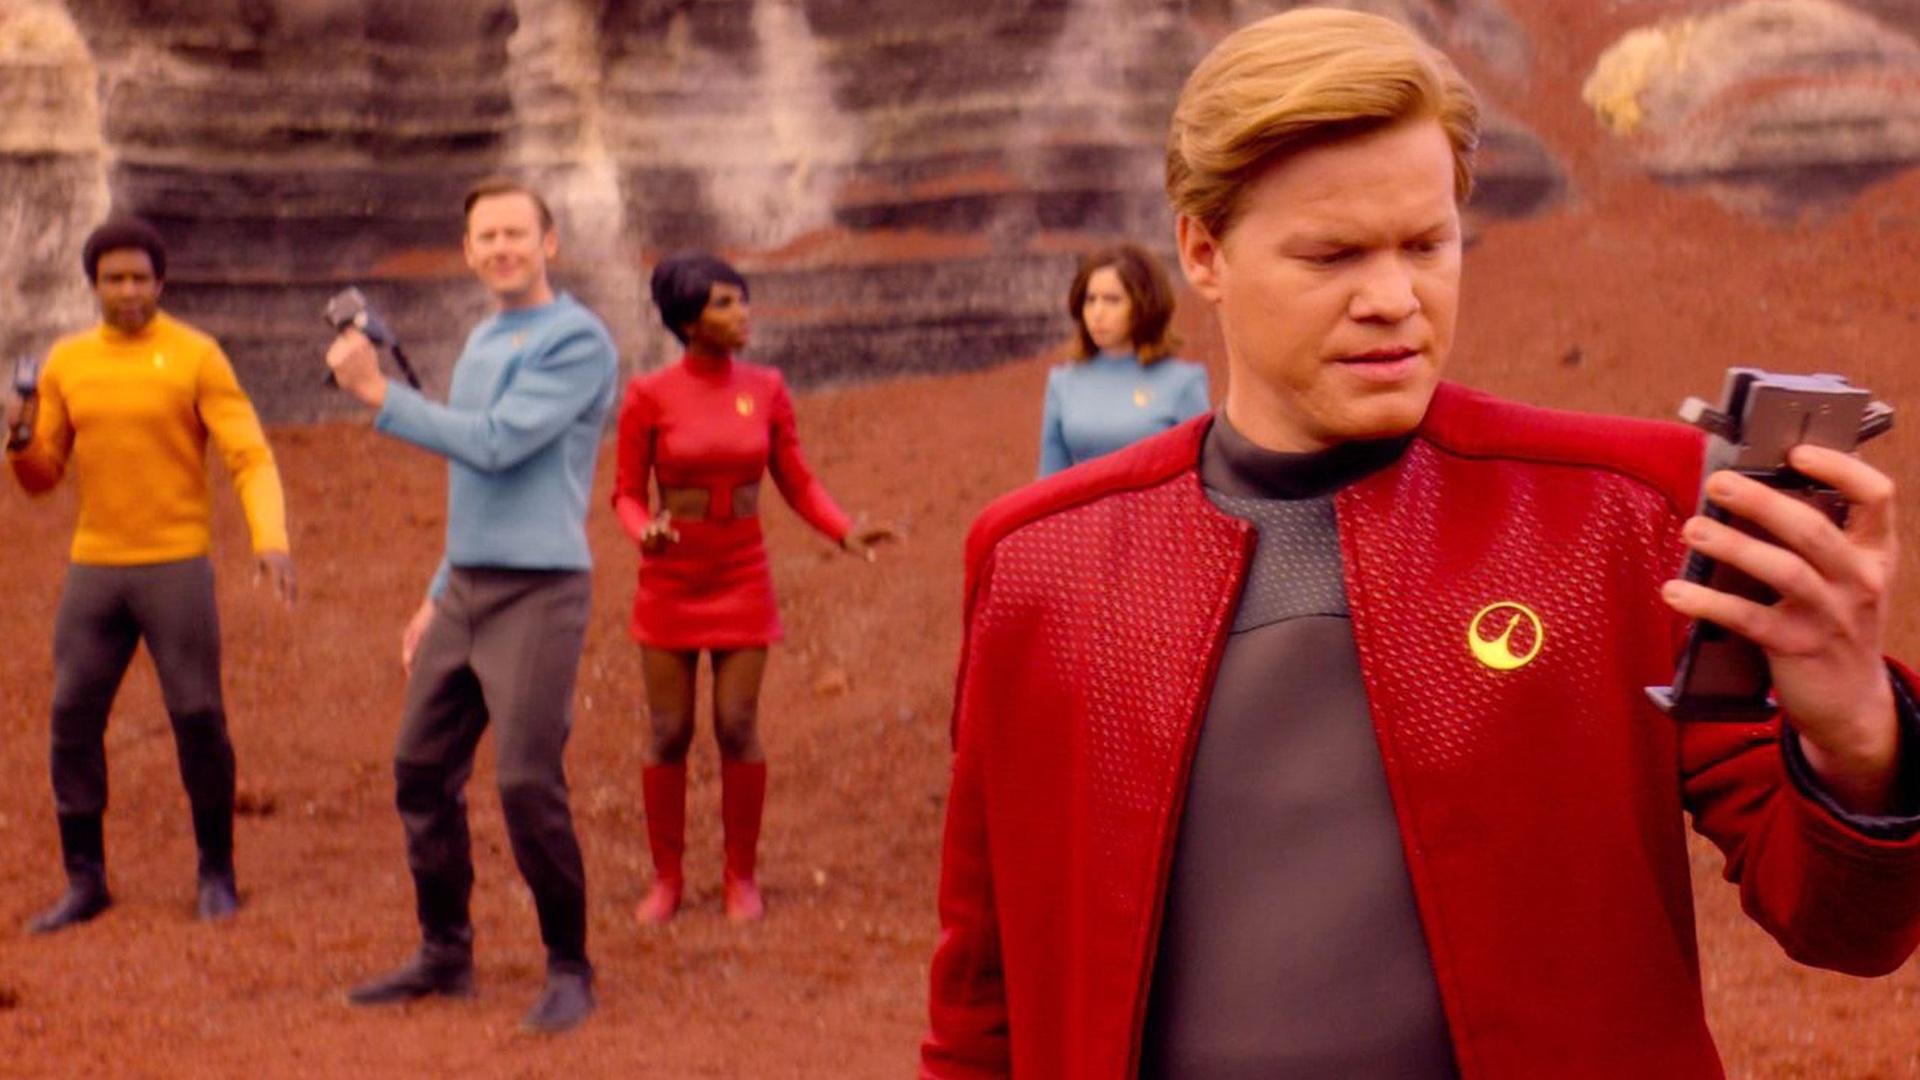 the-star-trek-inspired-black-mirror-episode-uss-callister-could-get-a-spinoff-series-social.jpg